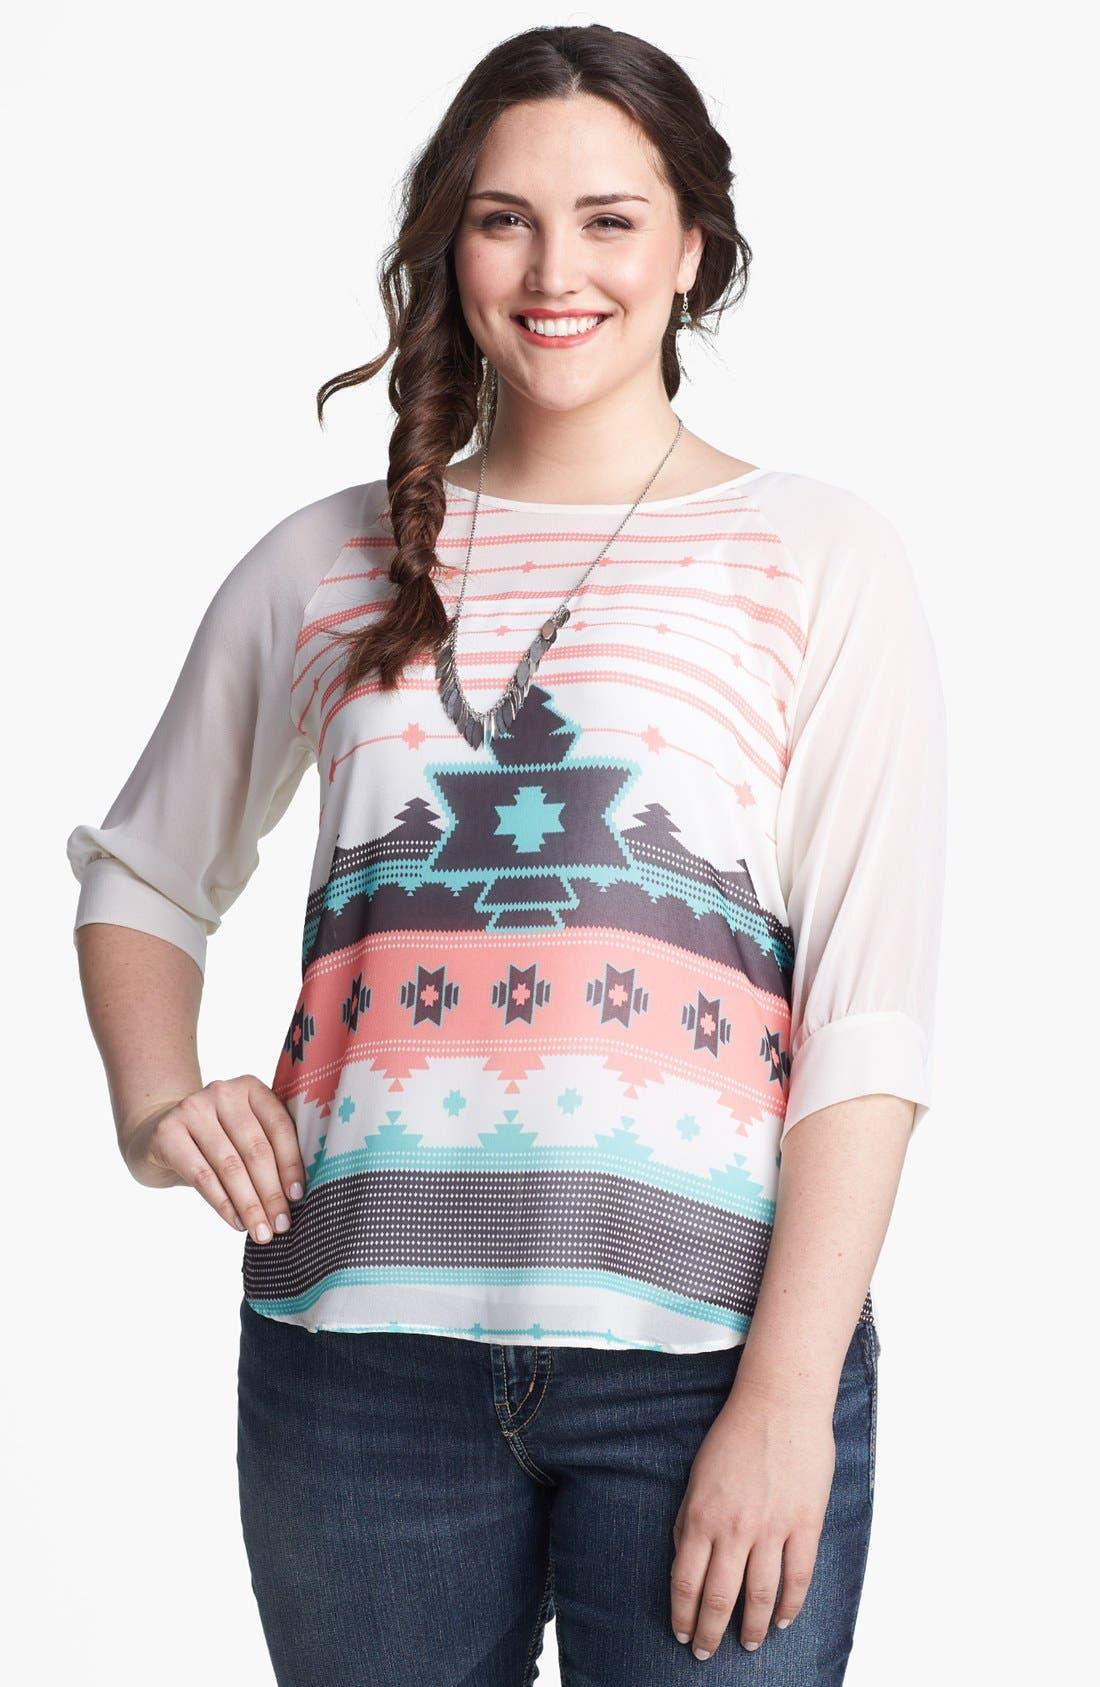 Alternate Image 1 Selected - Painted Threads Print Tie Back Top (Juniors Plus)